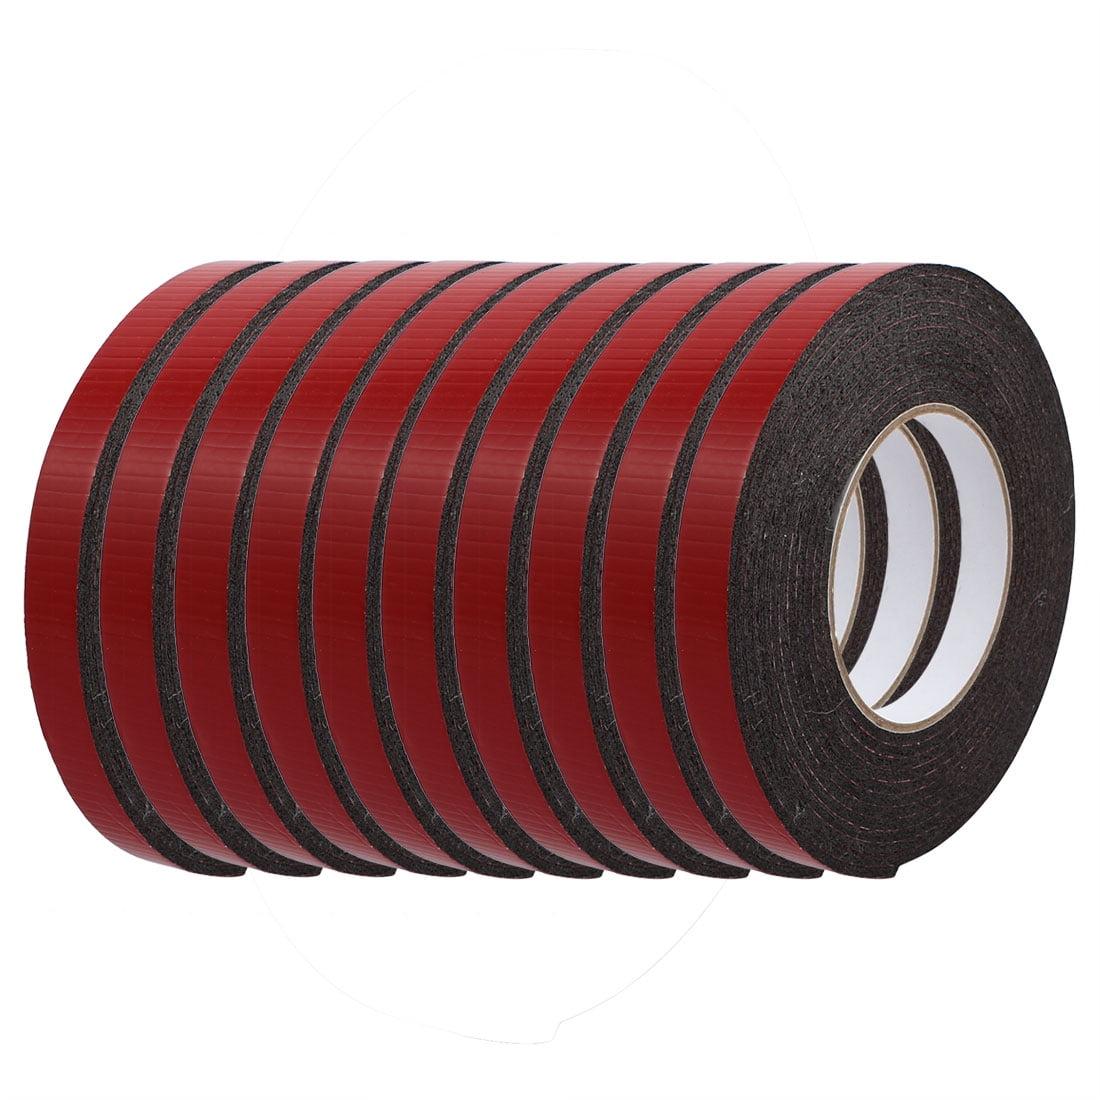 10pcs 5M 15mm x 3mm Dual-side Adhesive Shockproof Sponge Foam Tape Red Black